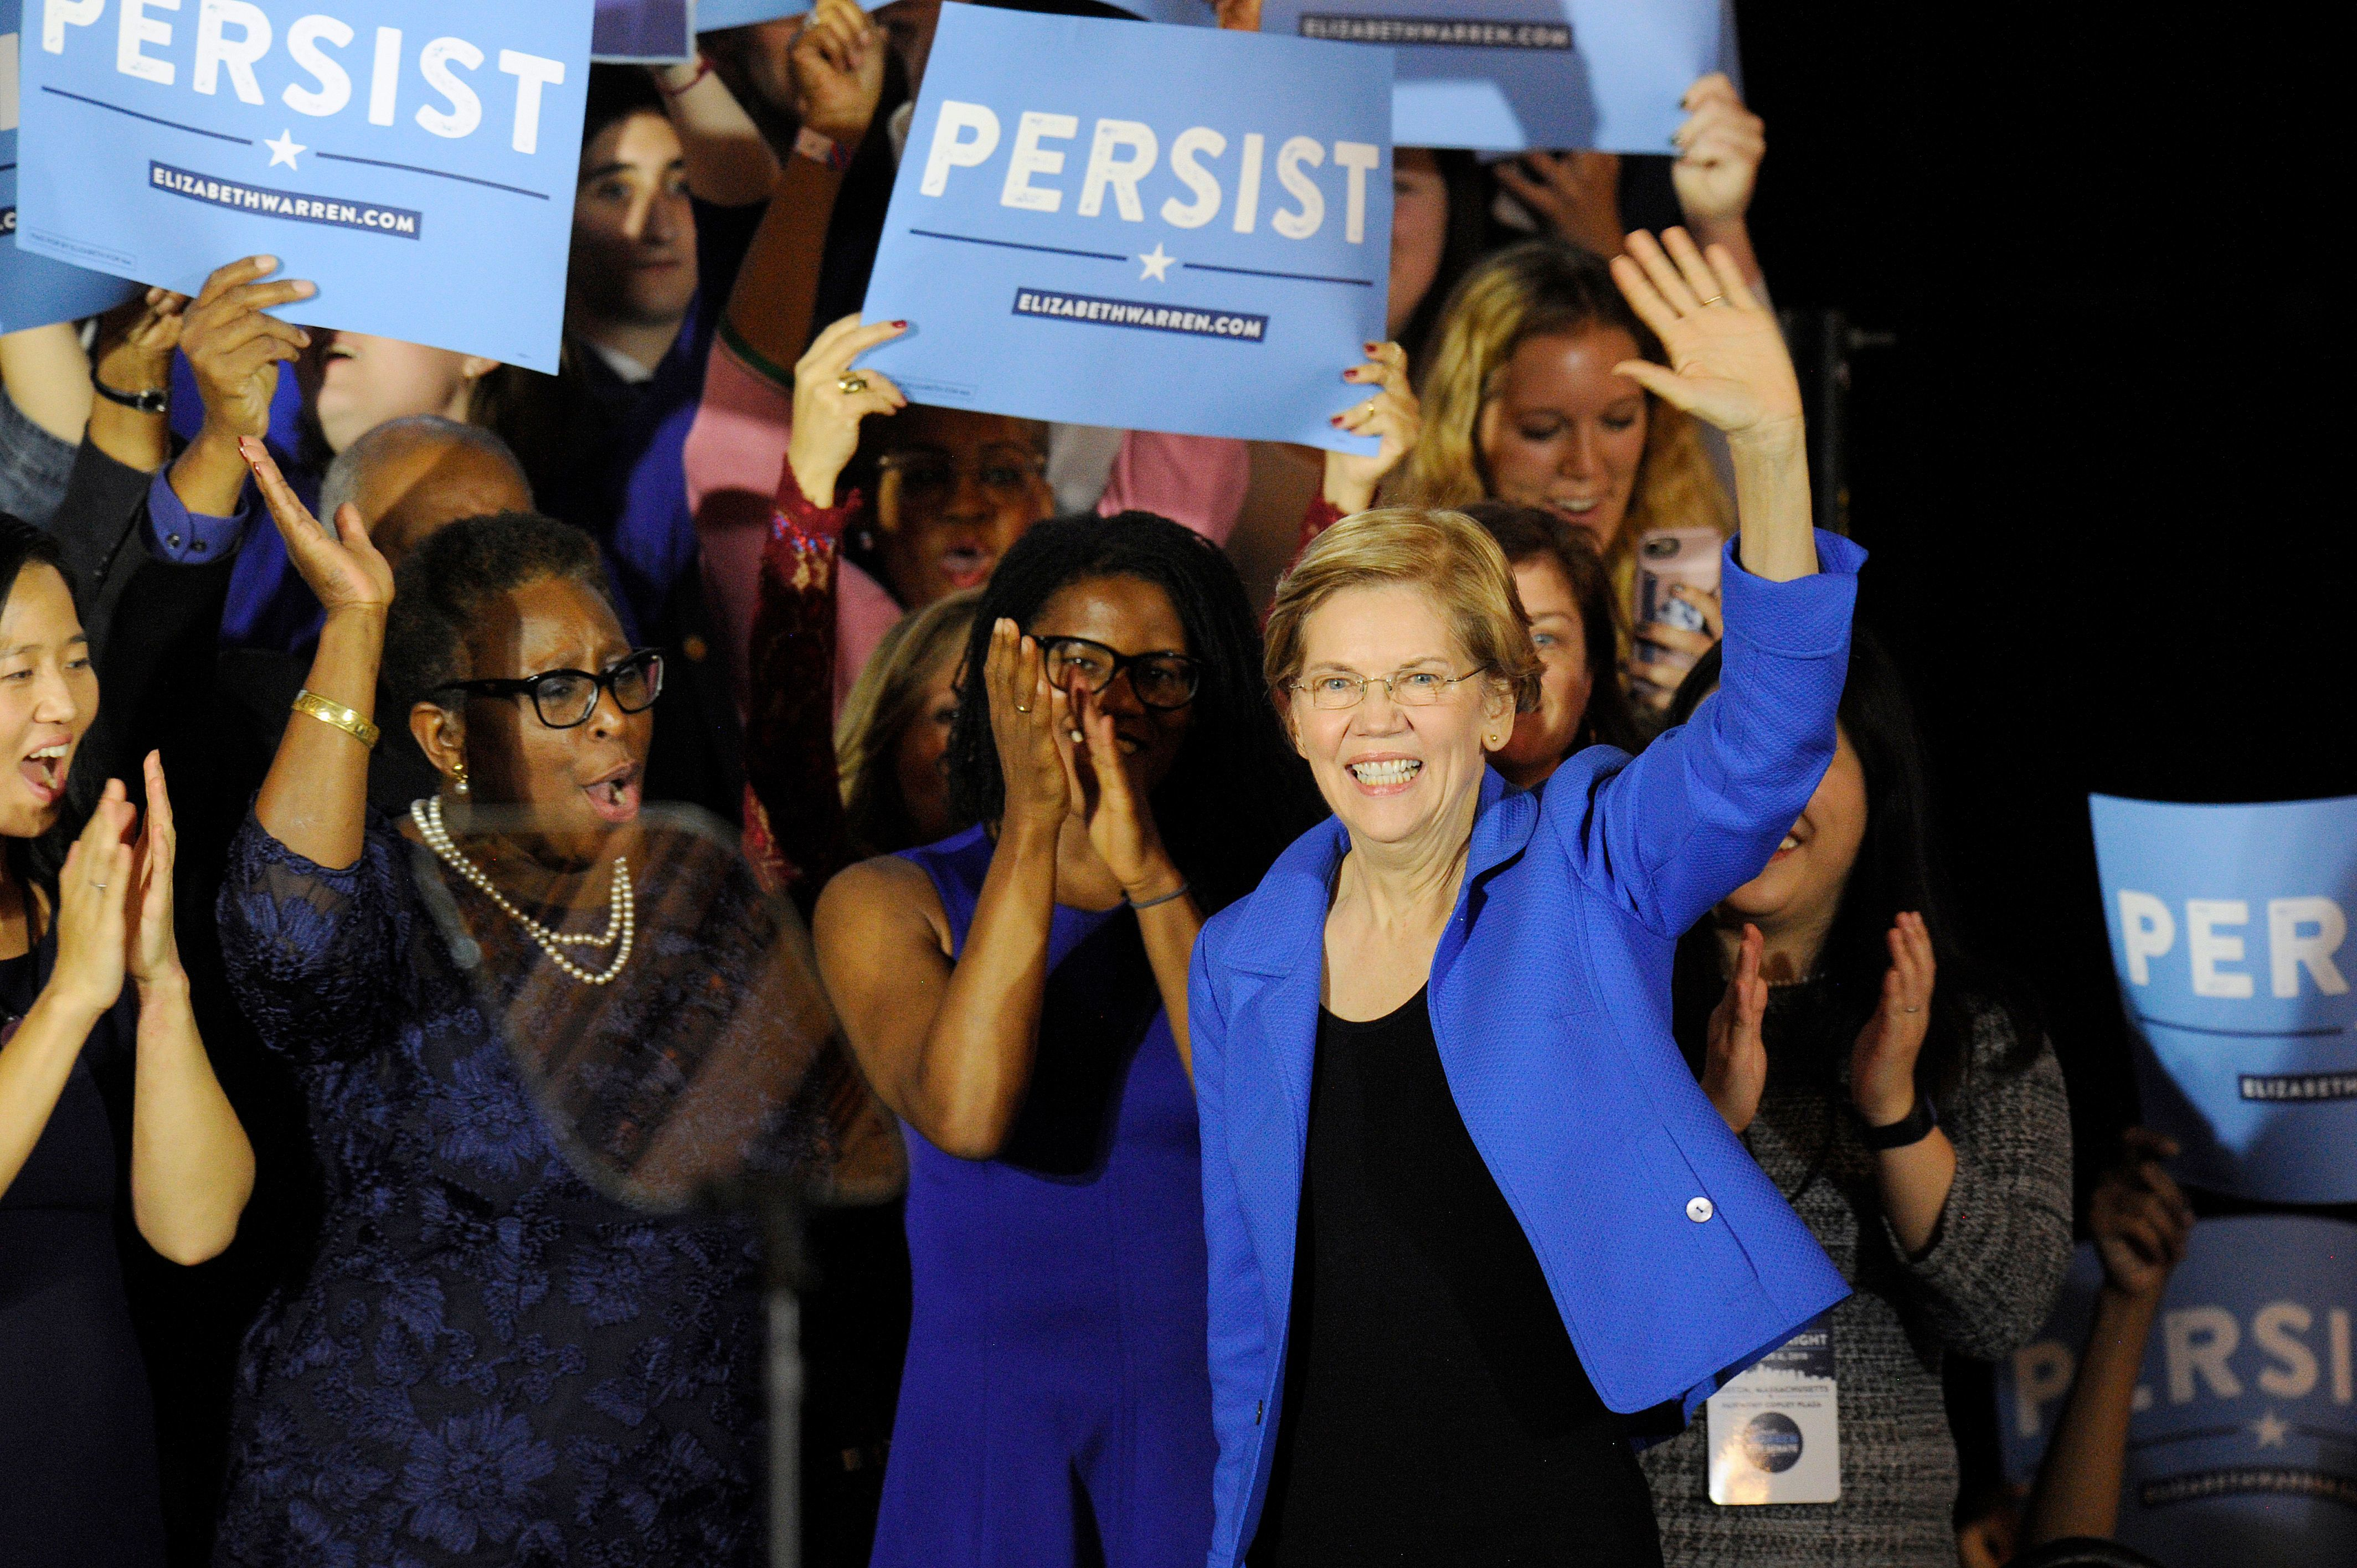 Sen. Elizabeth Warren of Massachusetts addresses the audience on Election Day in November 2018.